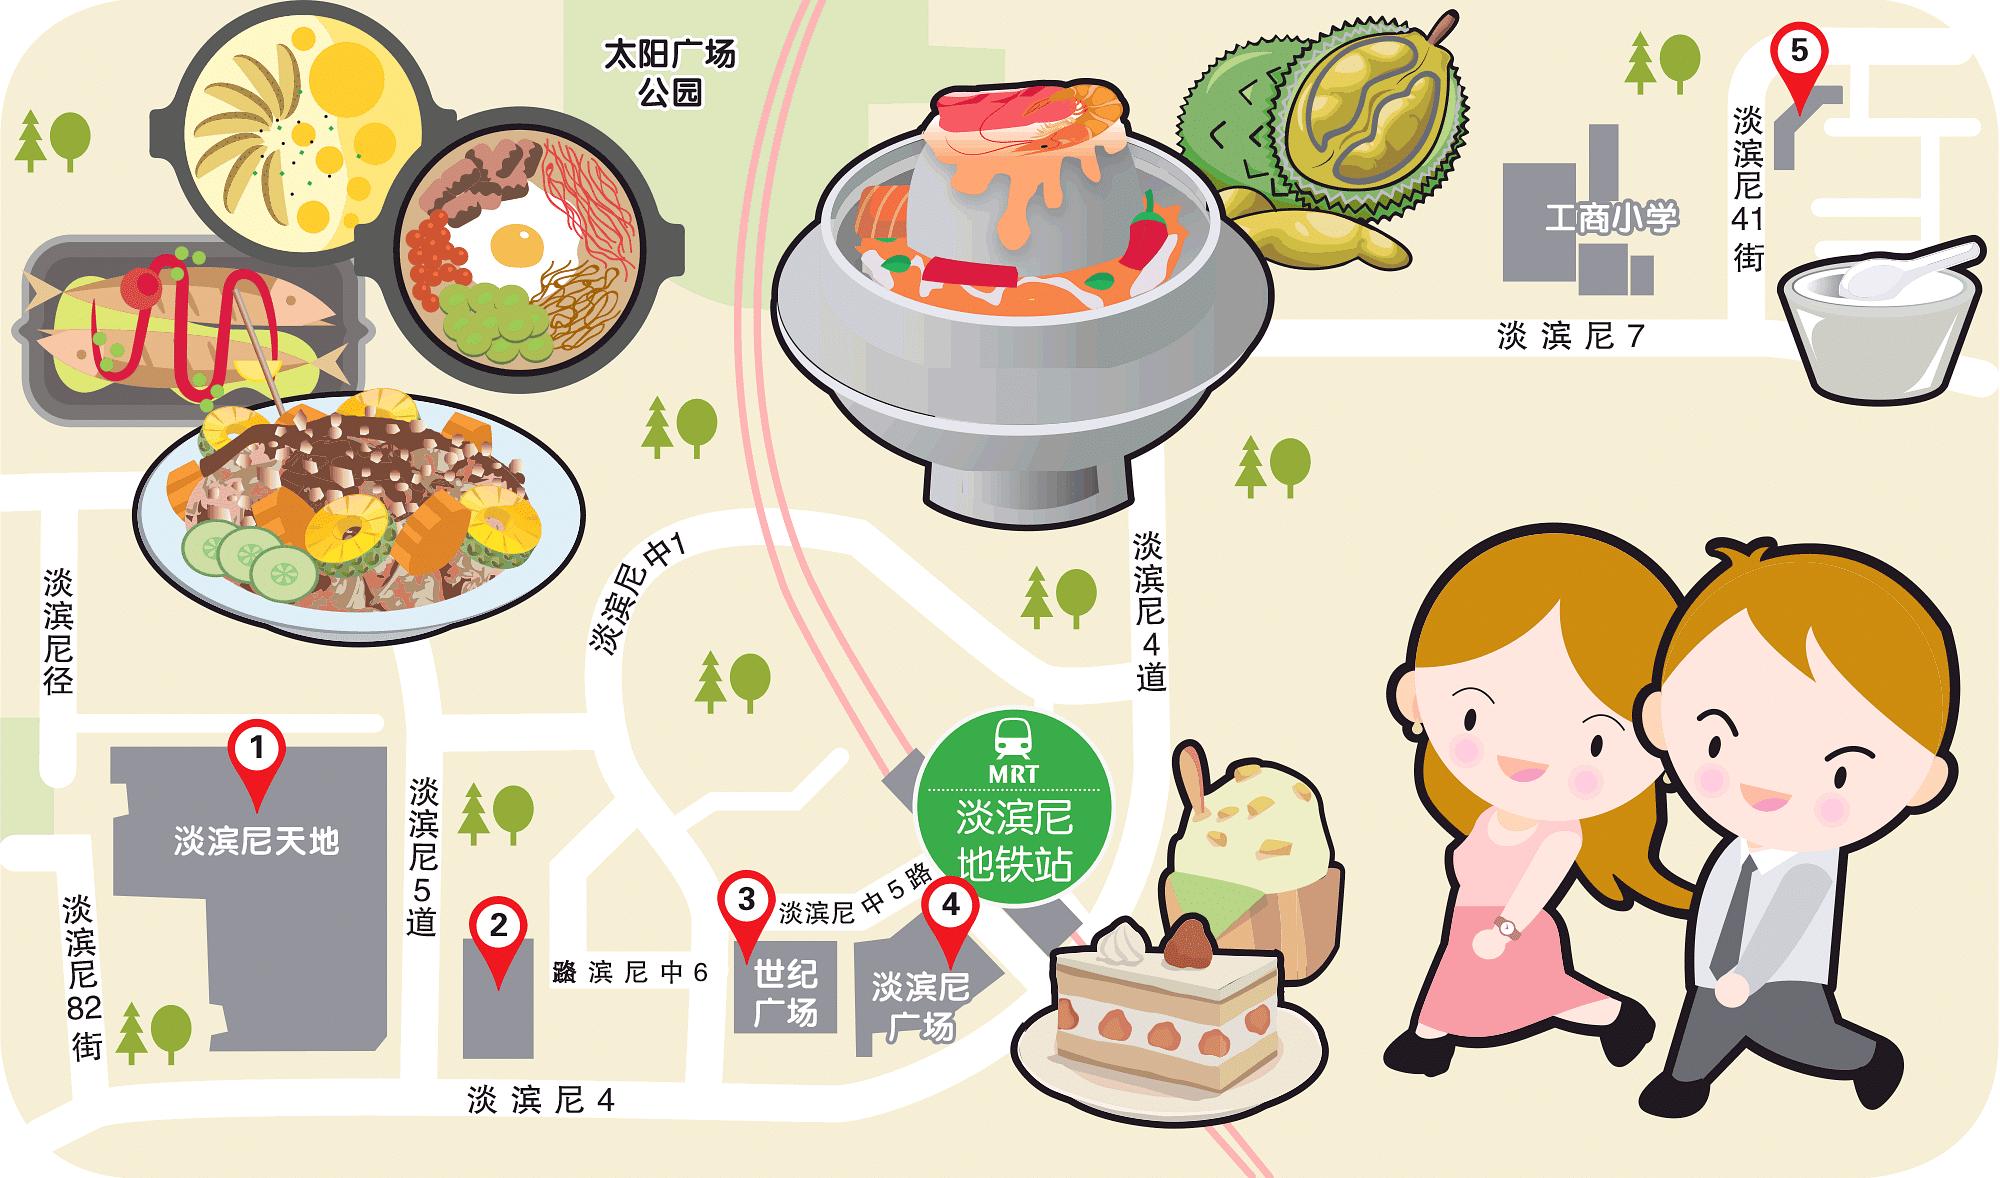 Wanbao Food Search @Tampines MRT Station